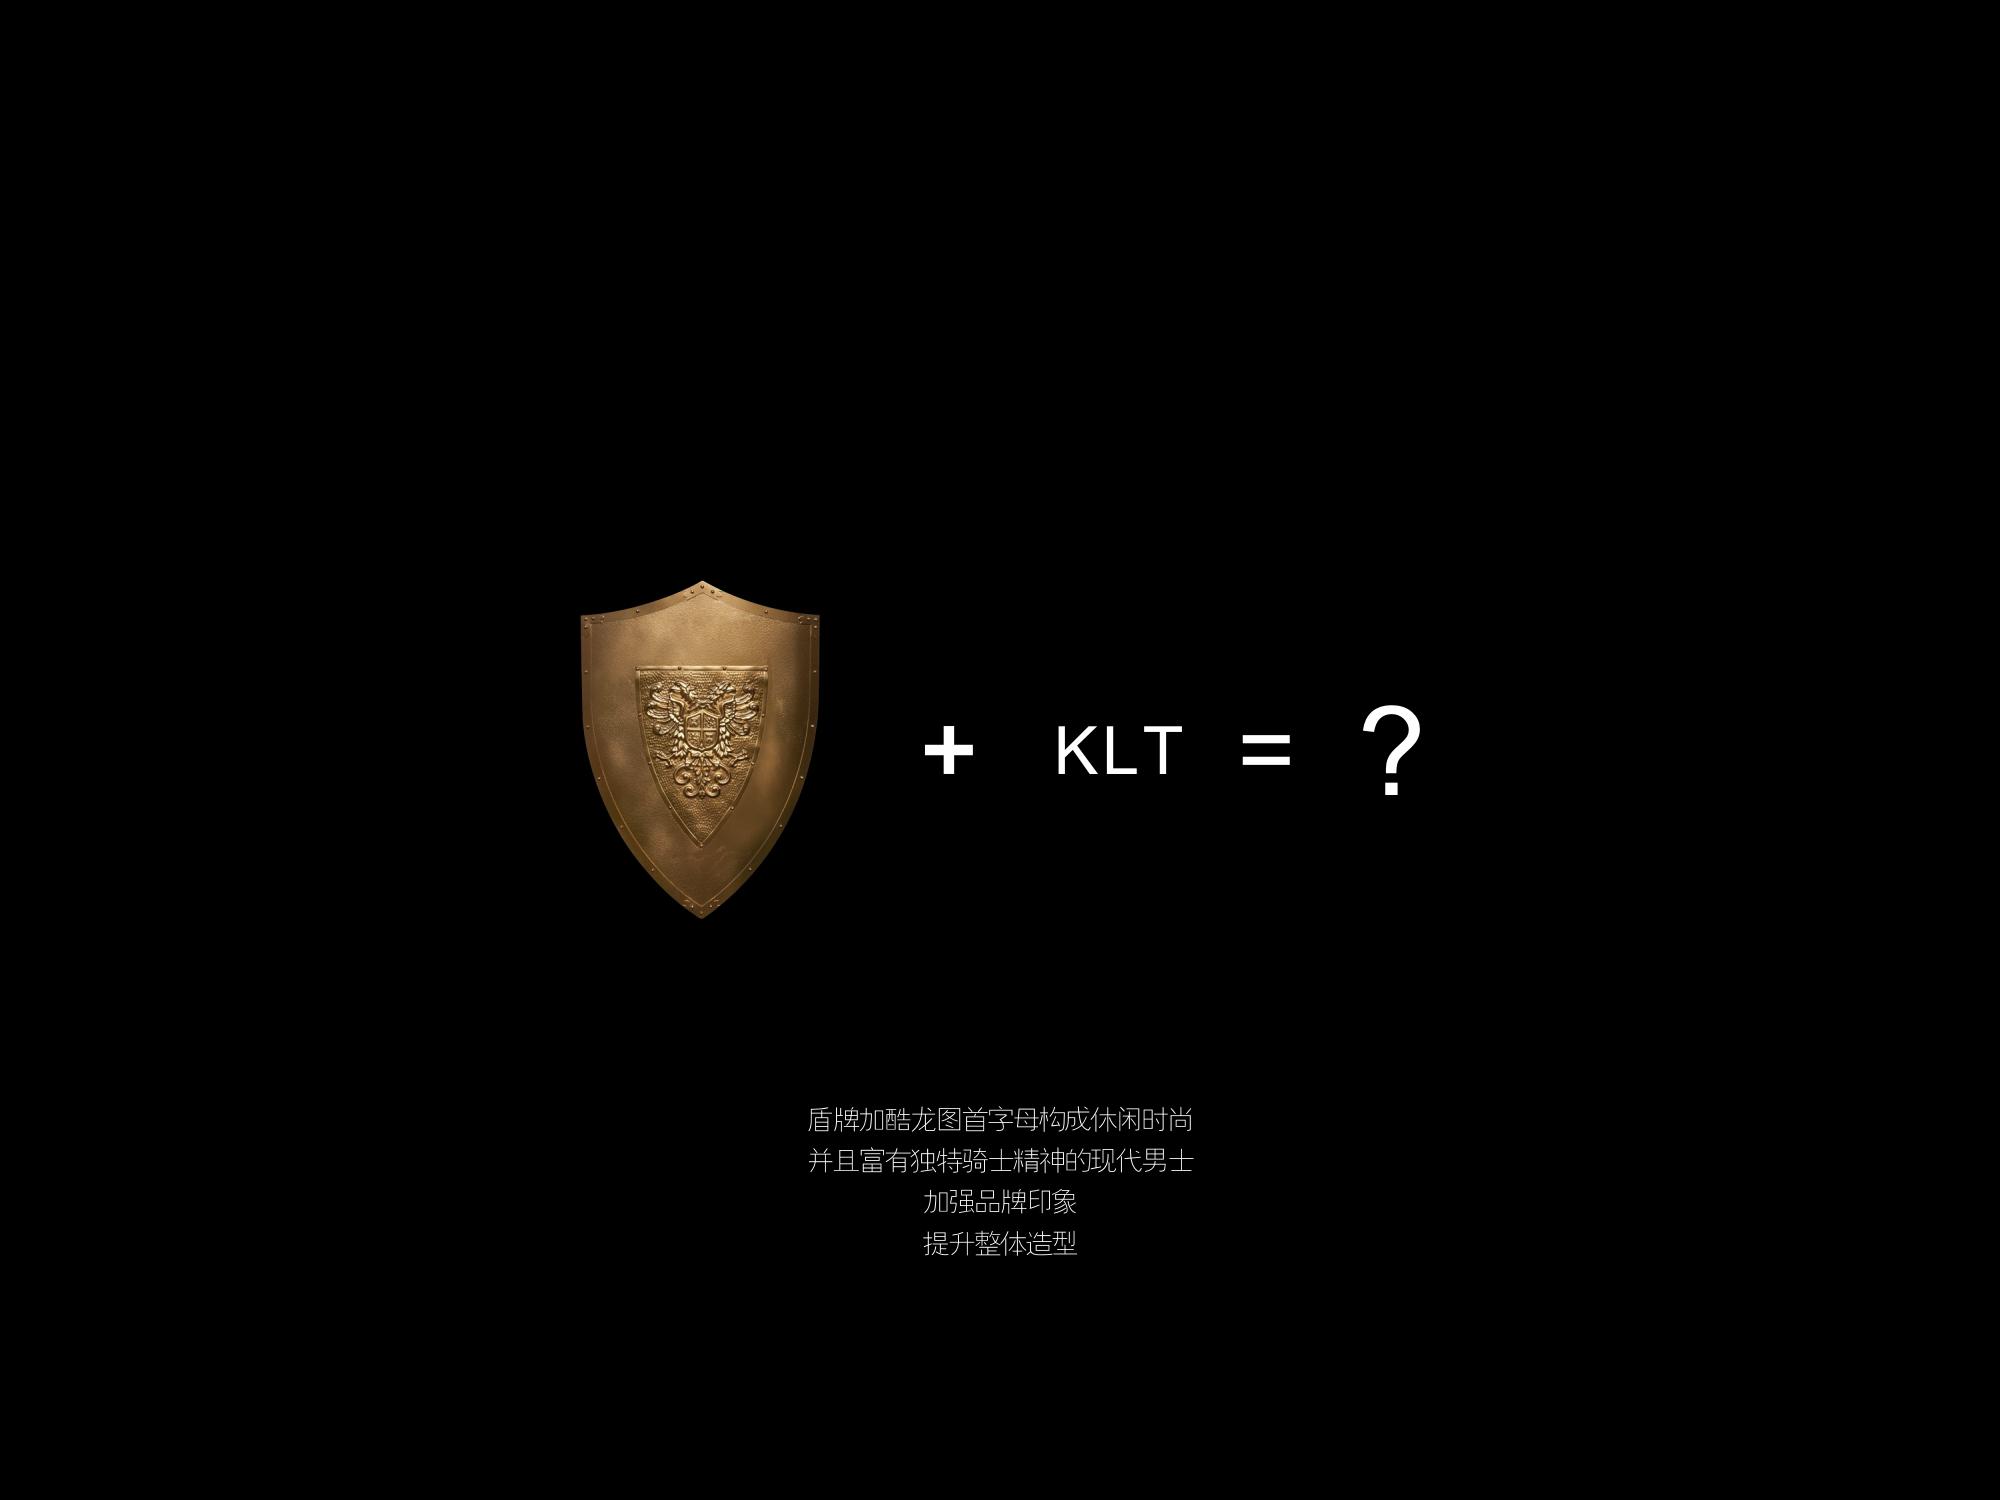 klt 服饰品牌形象设计方案-壹行设计 yesimvdesign图片